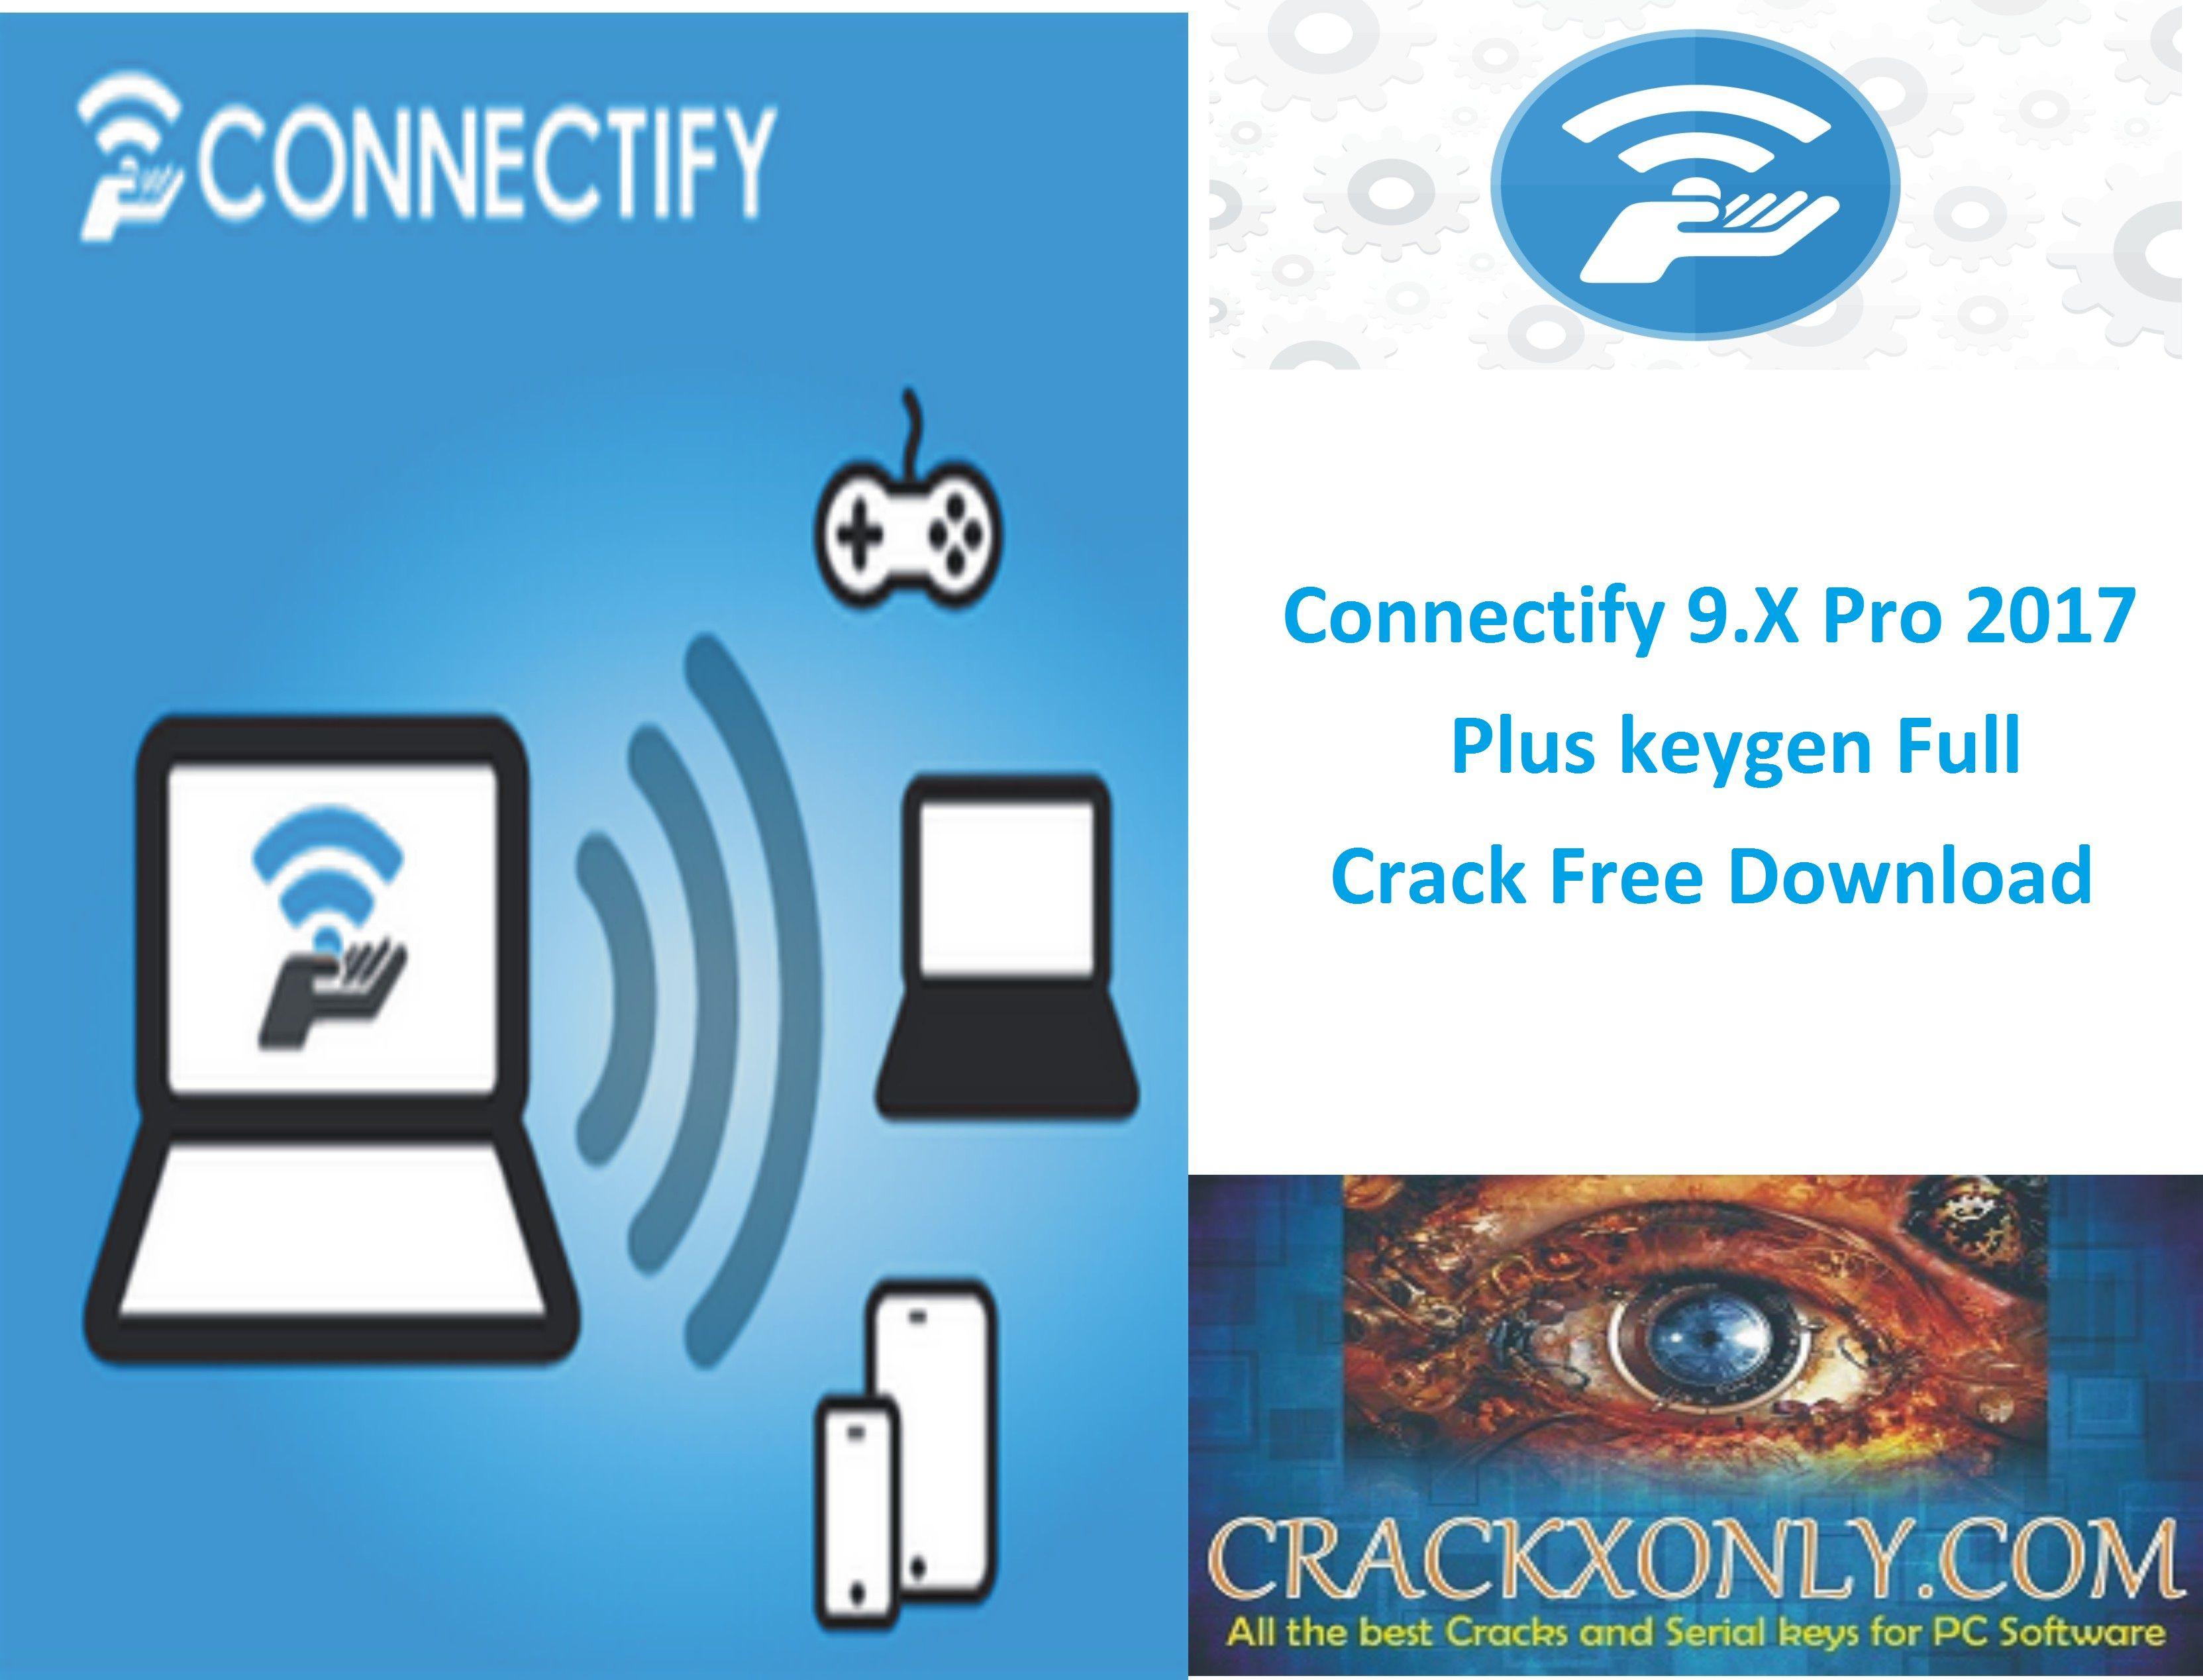 Download manycam enterprise 5 0 5 2 multilingual - Connectify Hotspot 2017 Pro Crack Activator Full Free Download Connectify Hotspot 2017 Pro Crack Connectify Hotspot 2017 Pro Activator Full Free